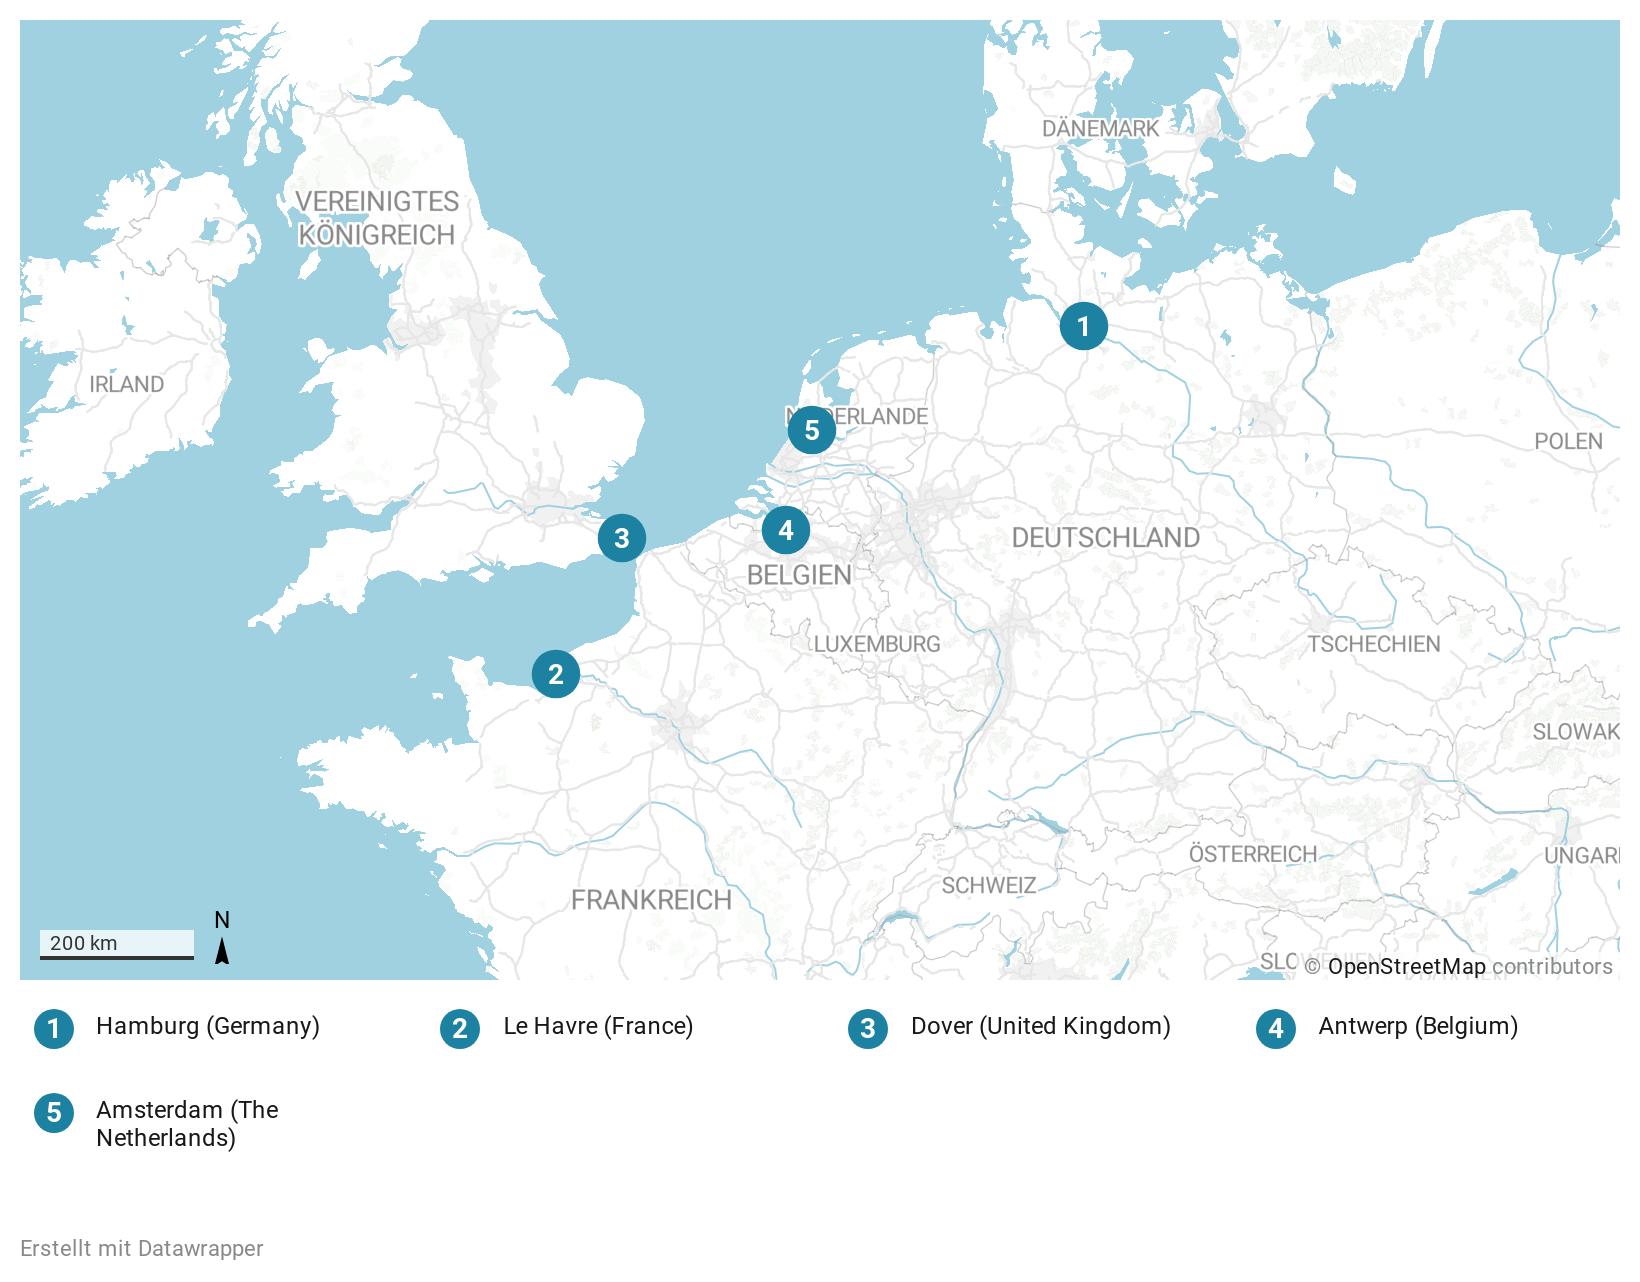 Route: Western Europe cruise aboard the cruise ship AIDAblu (AIDA Cruises)